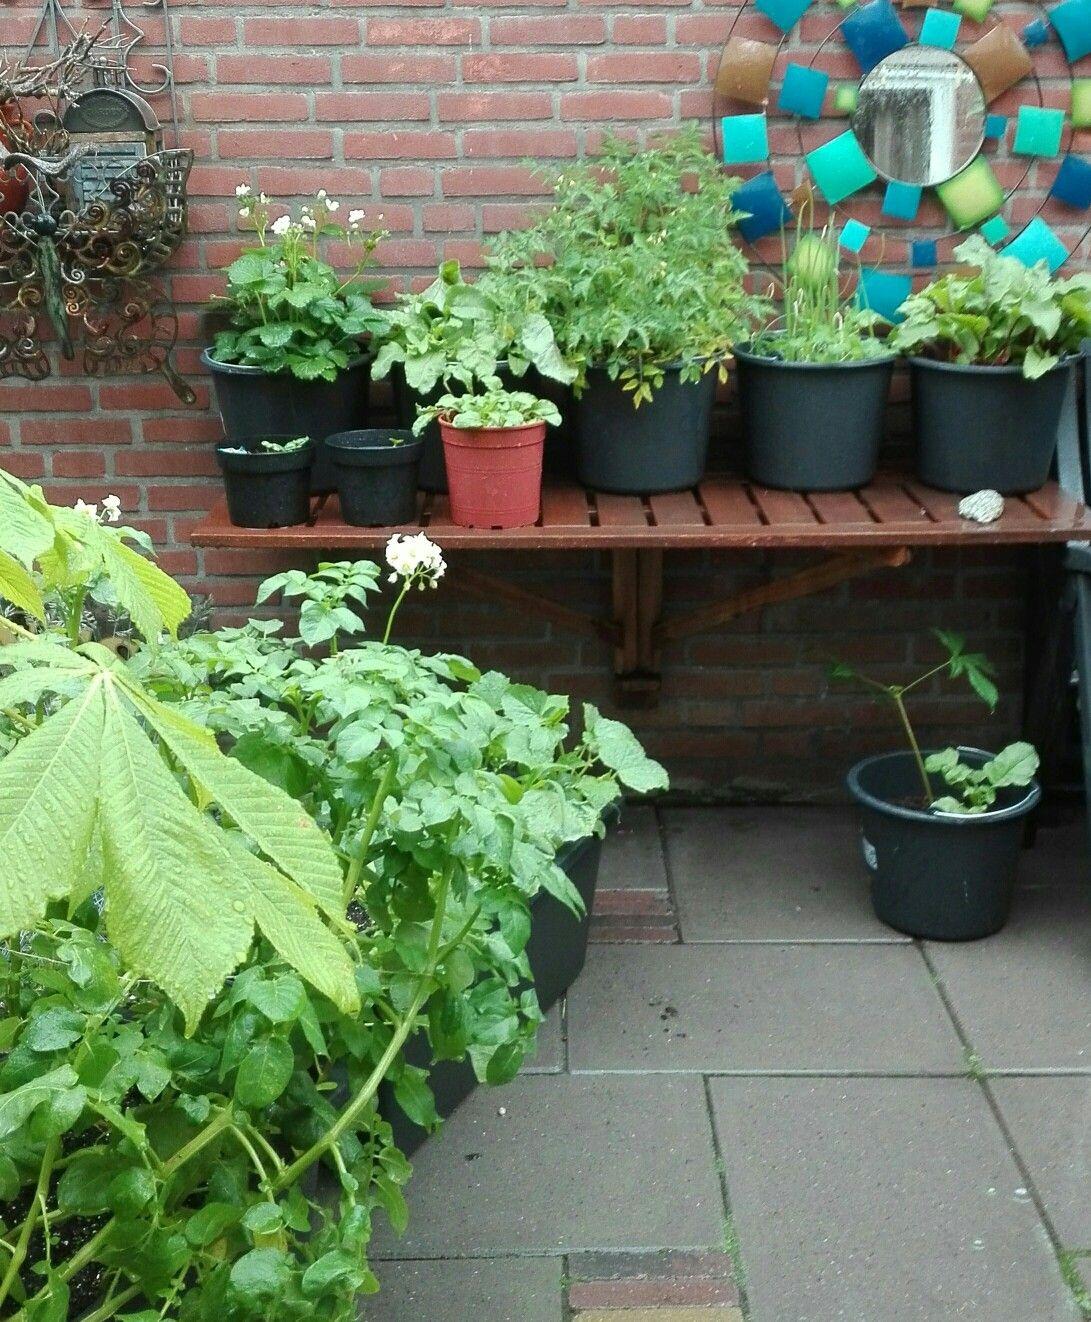 My garden,my food